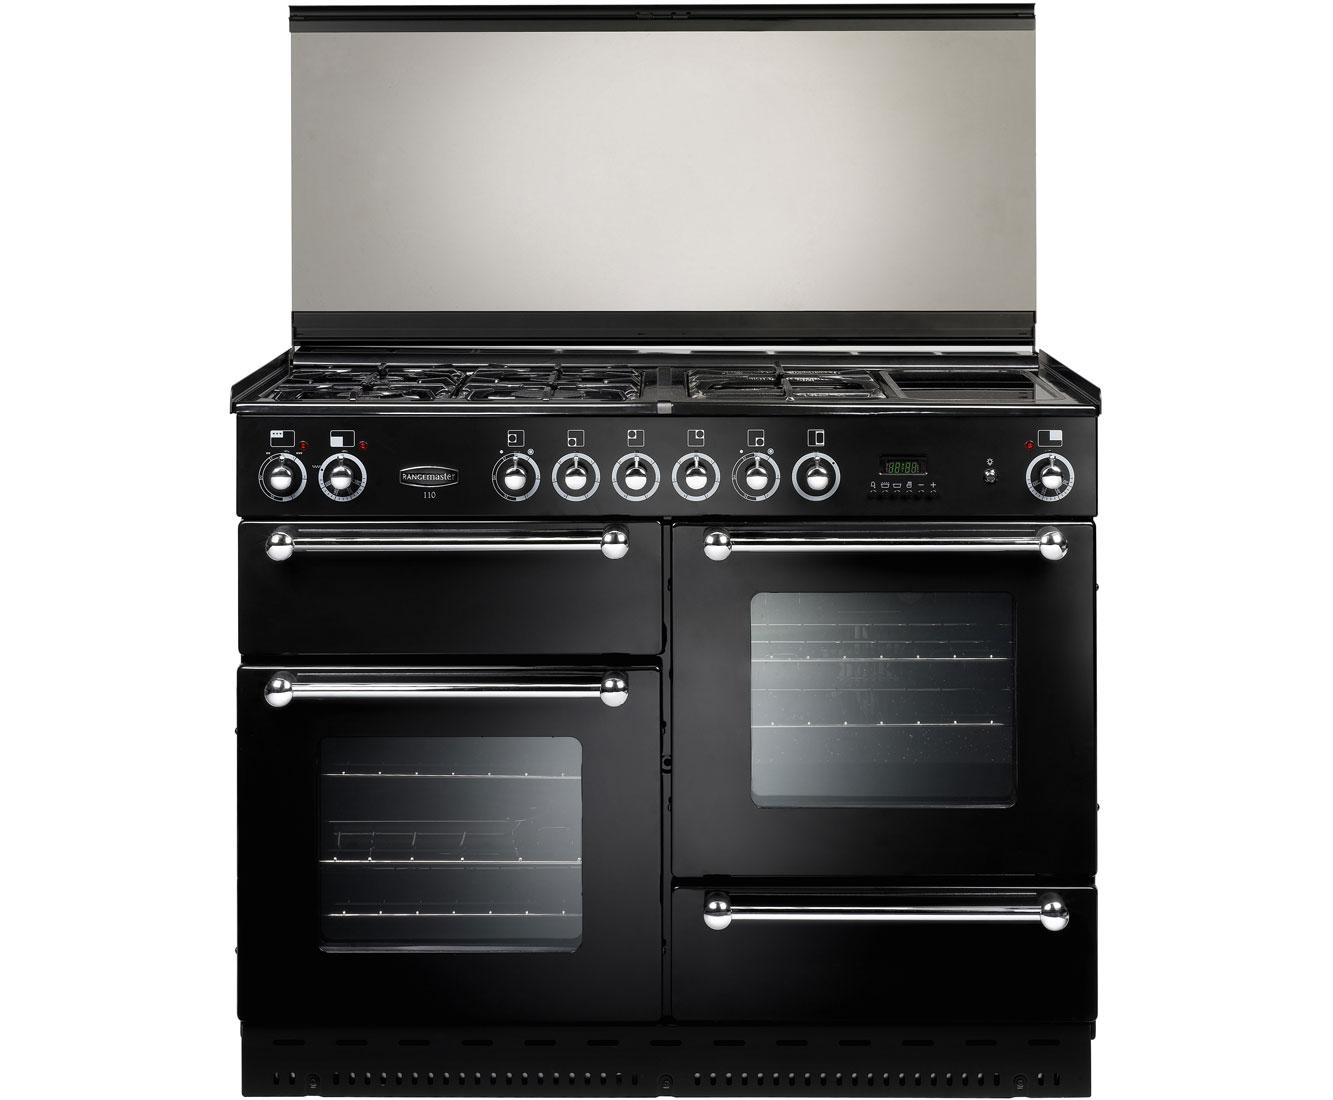 Rangemaster RMS110DFFBLPDC Free Standing Range Cooker in Black  Chrome